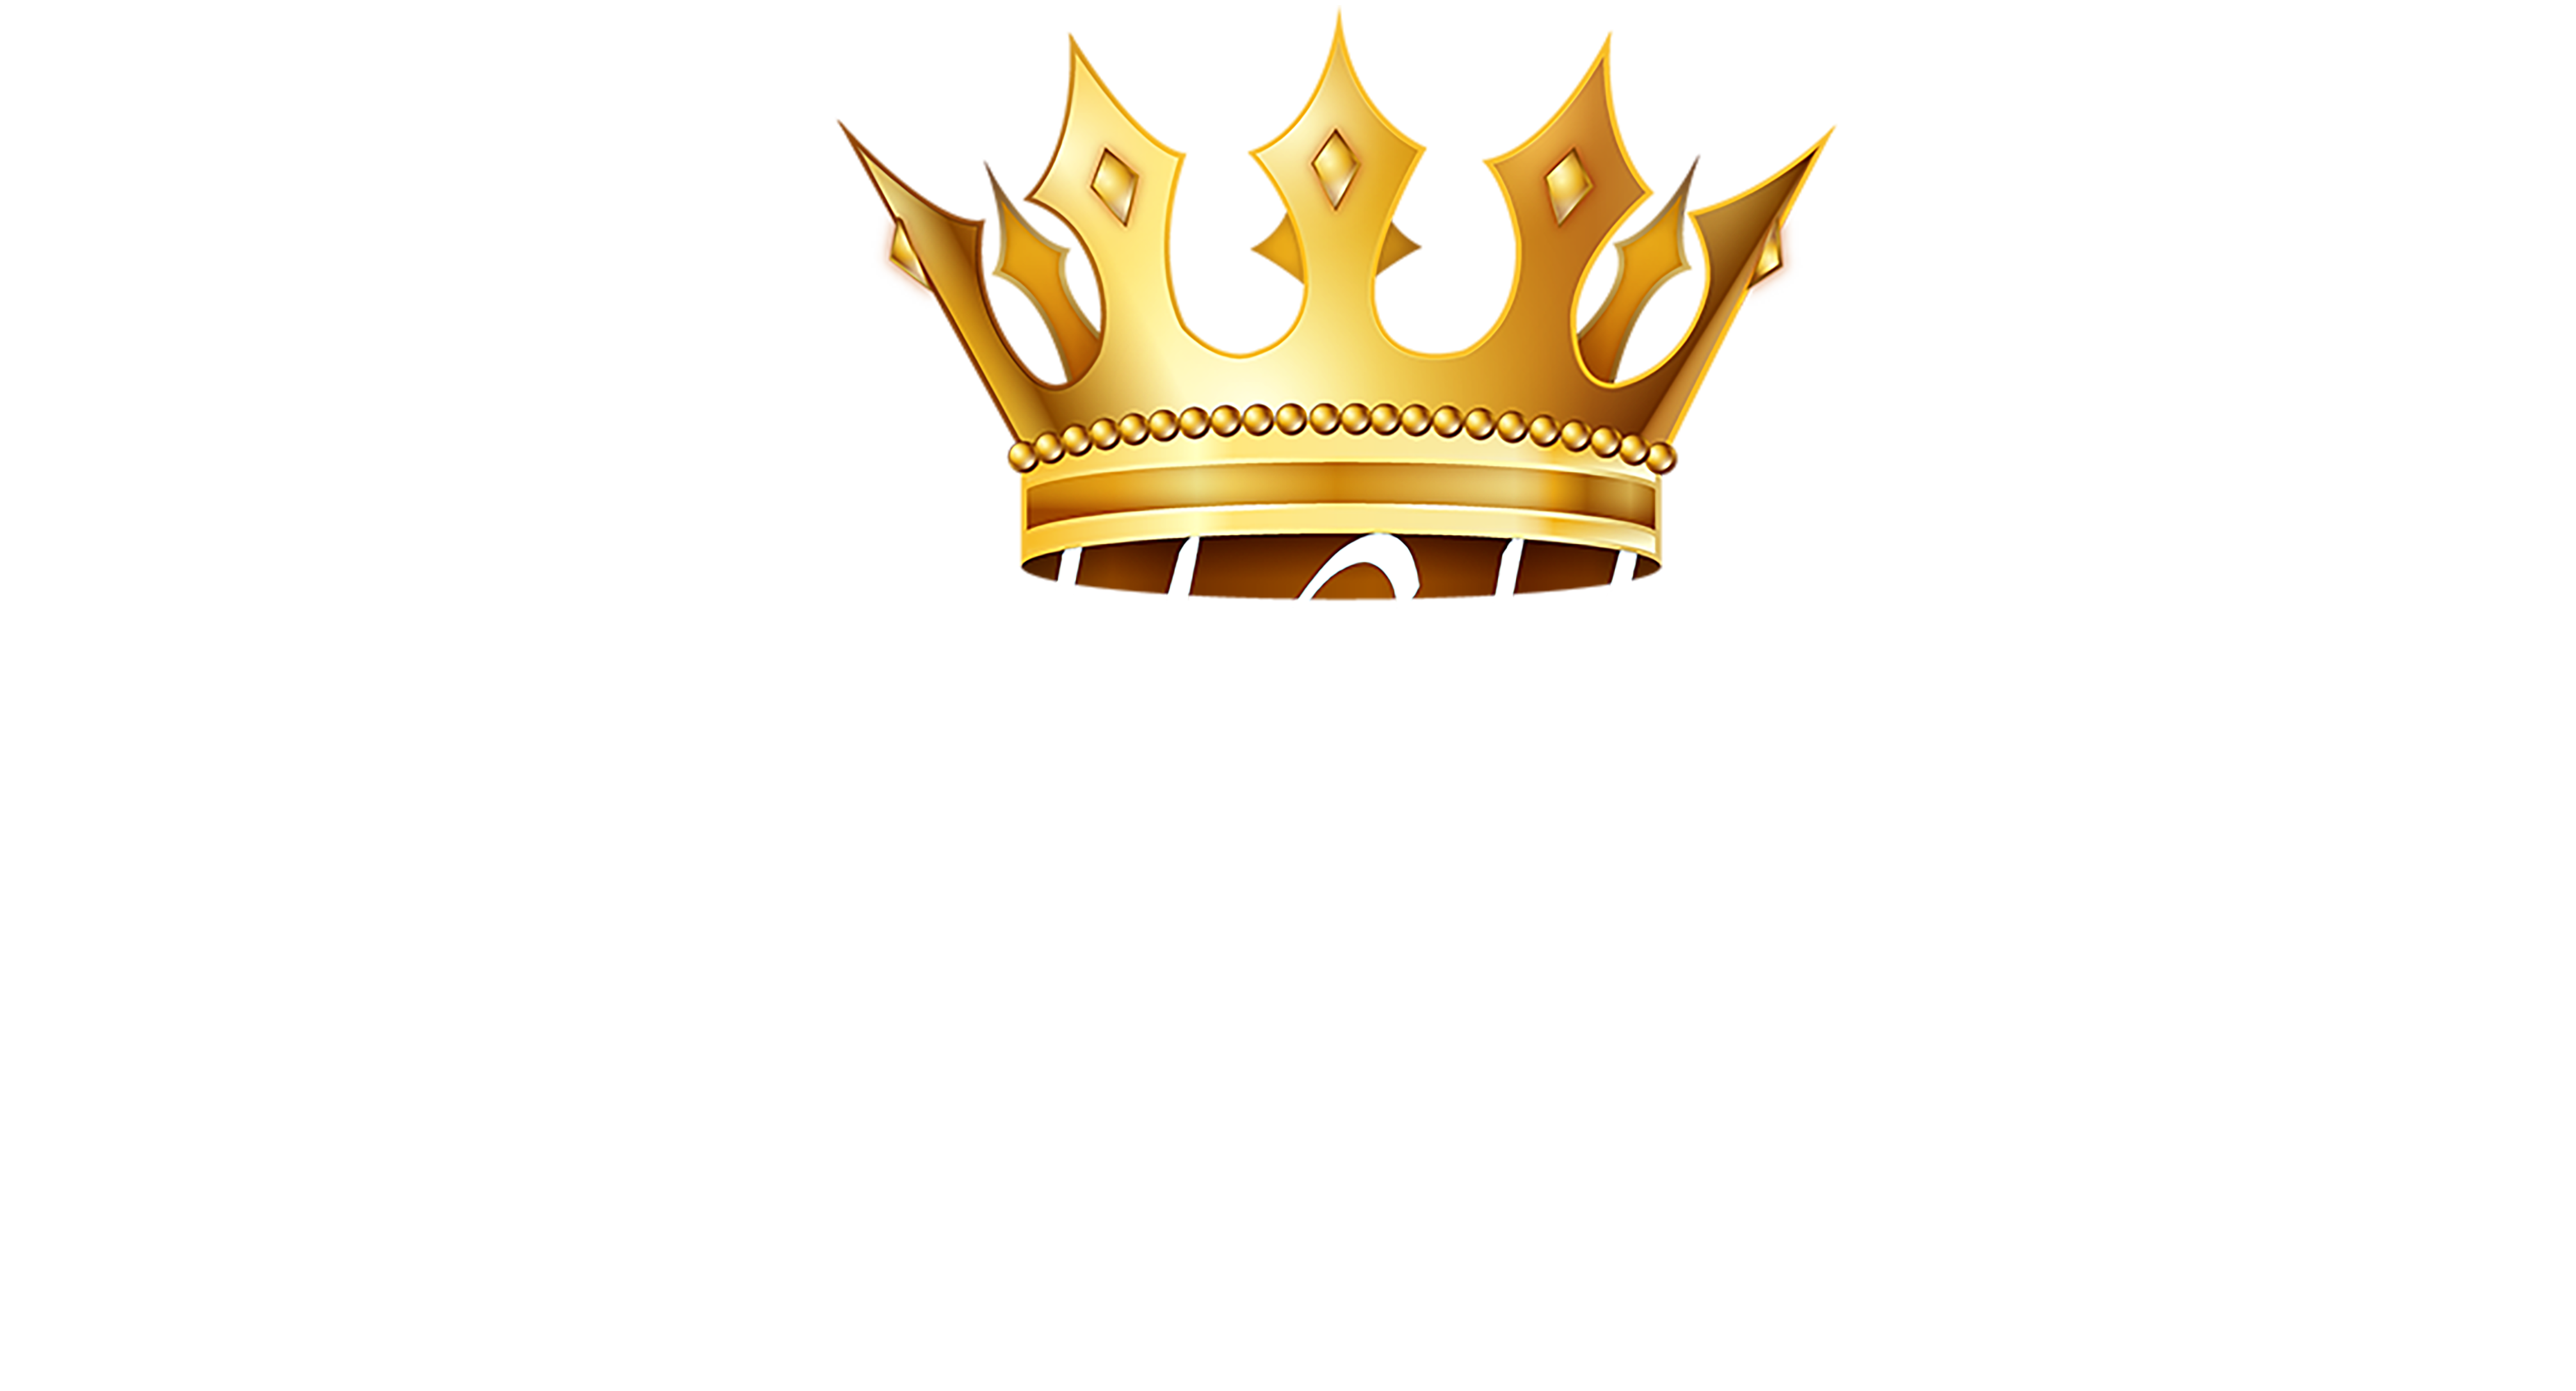 AugustoRe